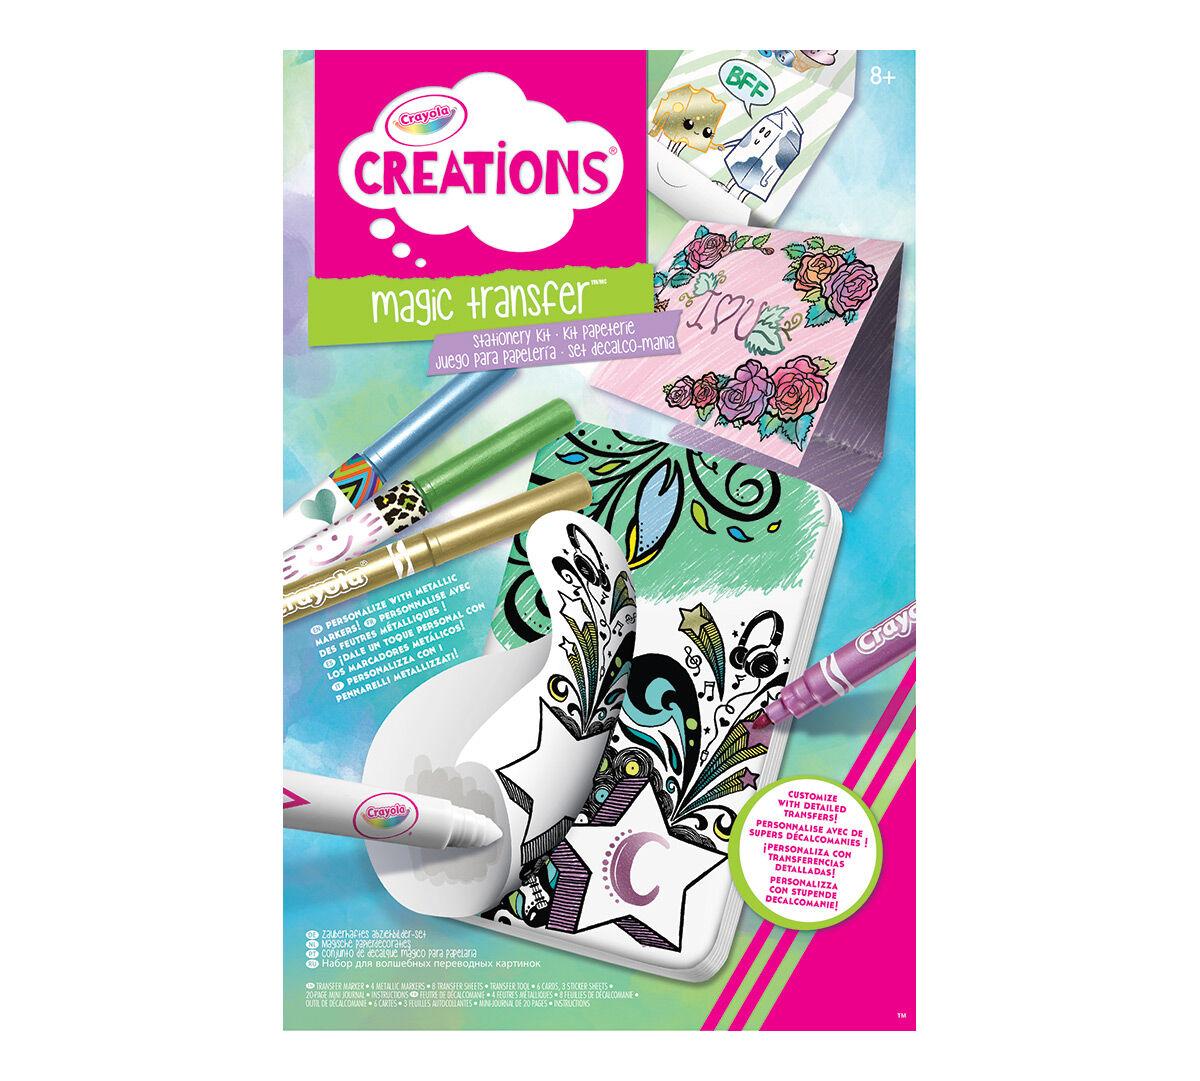 Crayola Creations Magic Transfer Stationery Set - Crayola